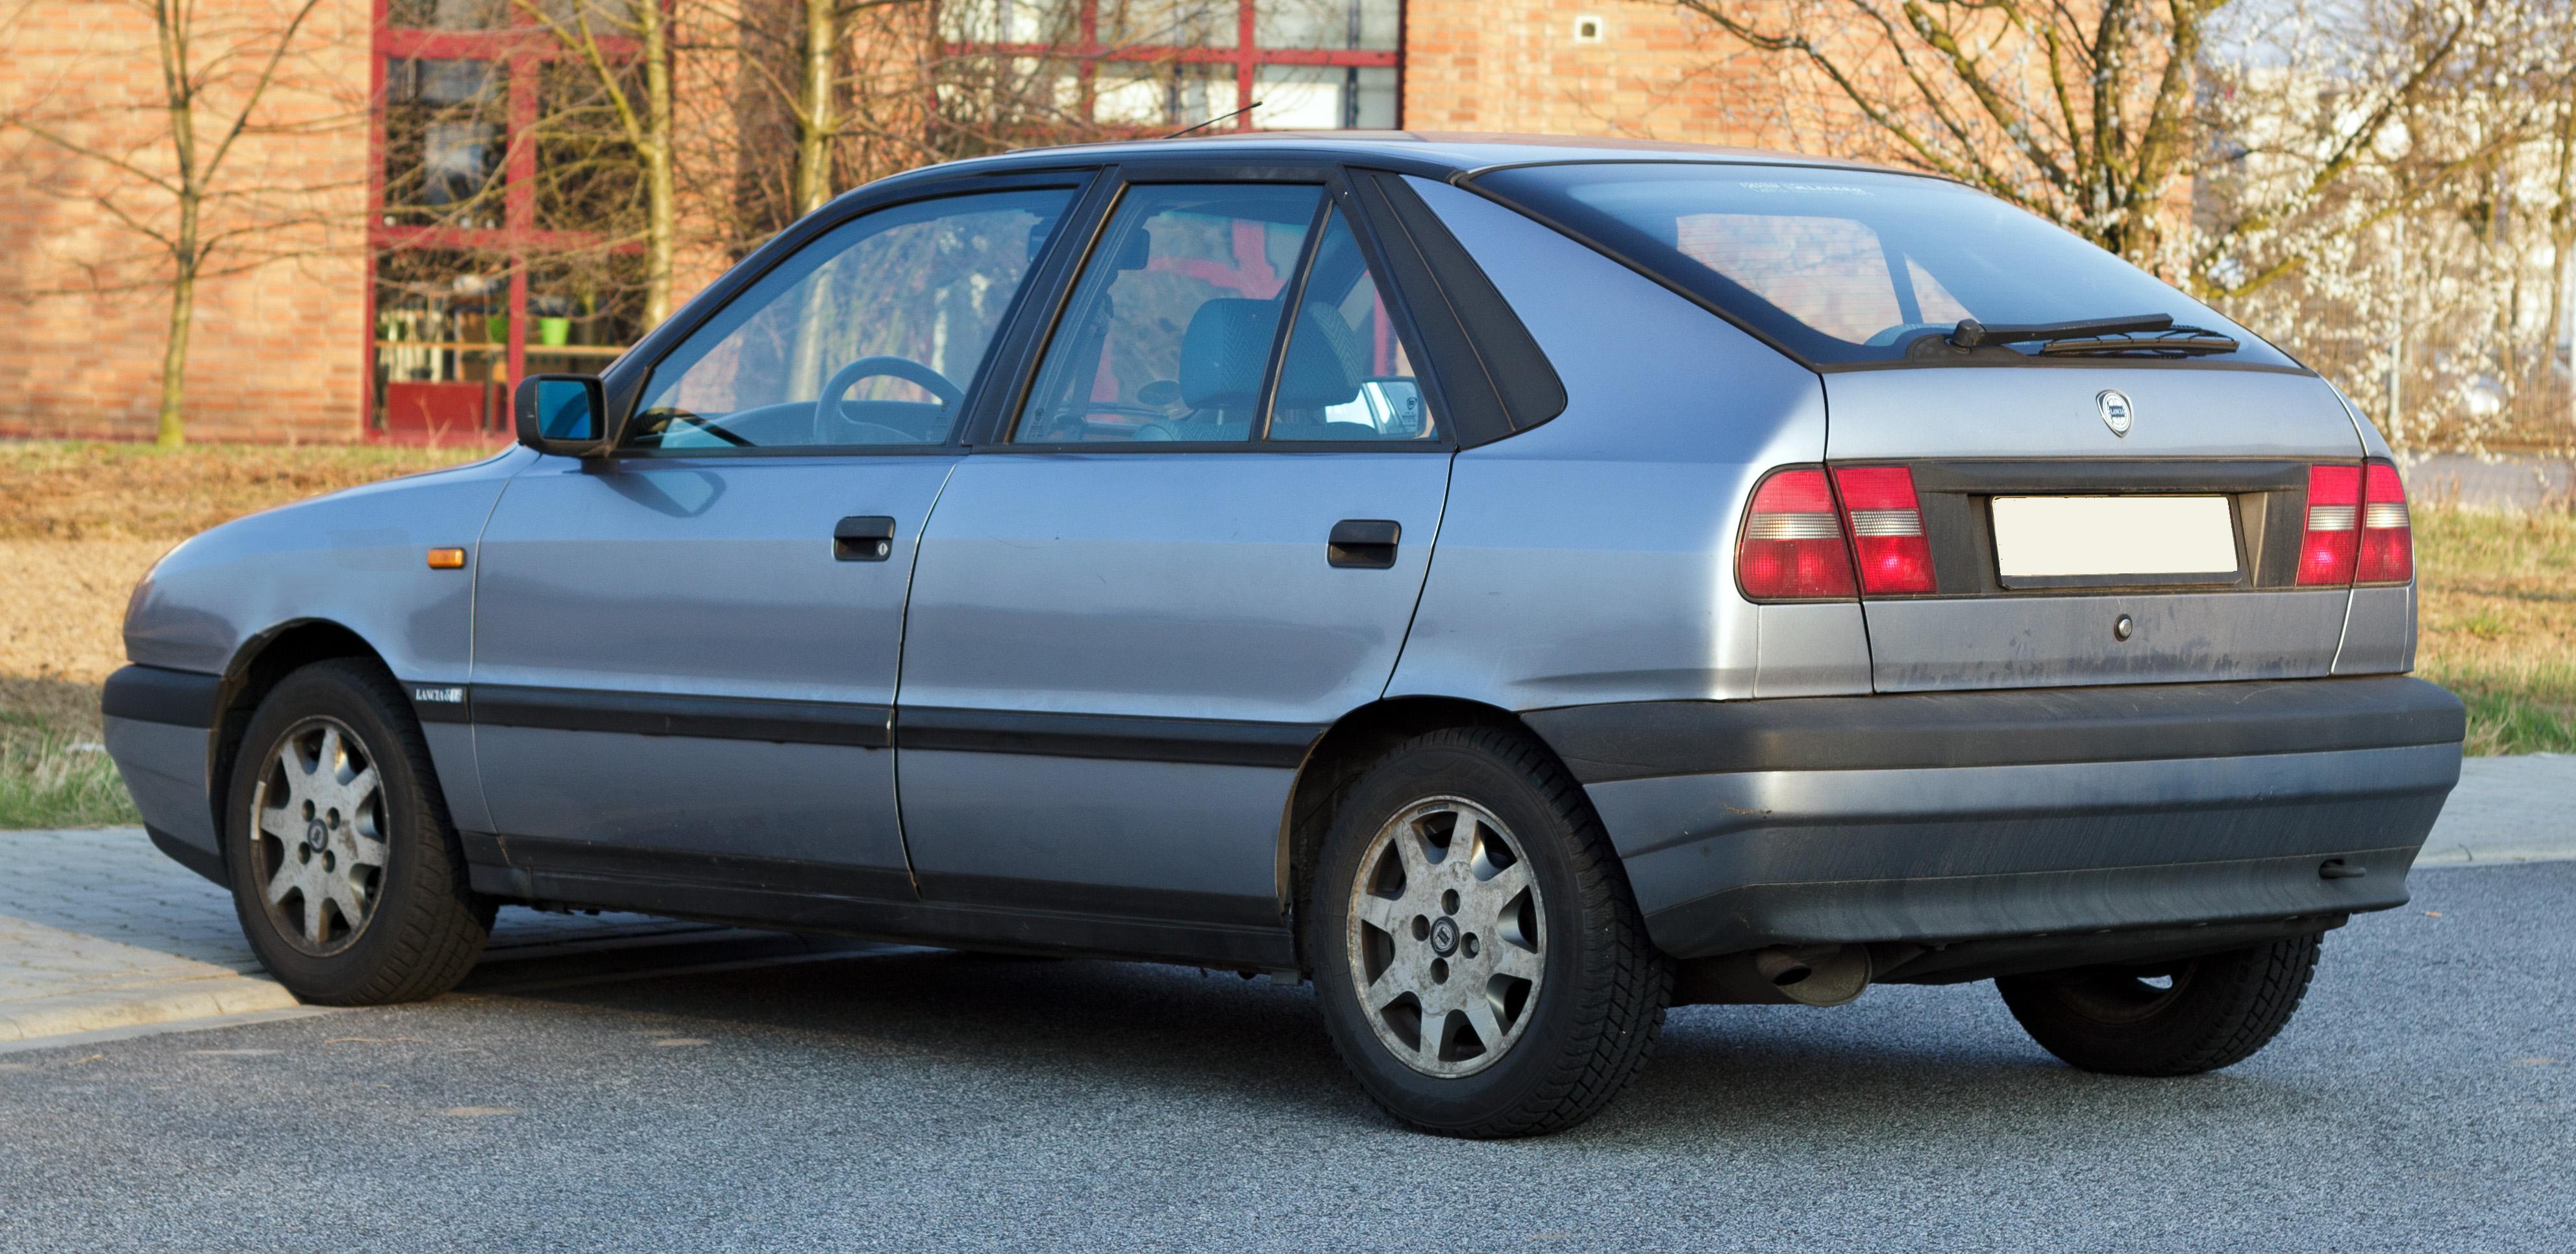 https://upload.wikimedia.org/wikipedia/commons/d/db/Lancia_Delta_II_rear_20120322.jpg